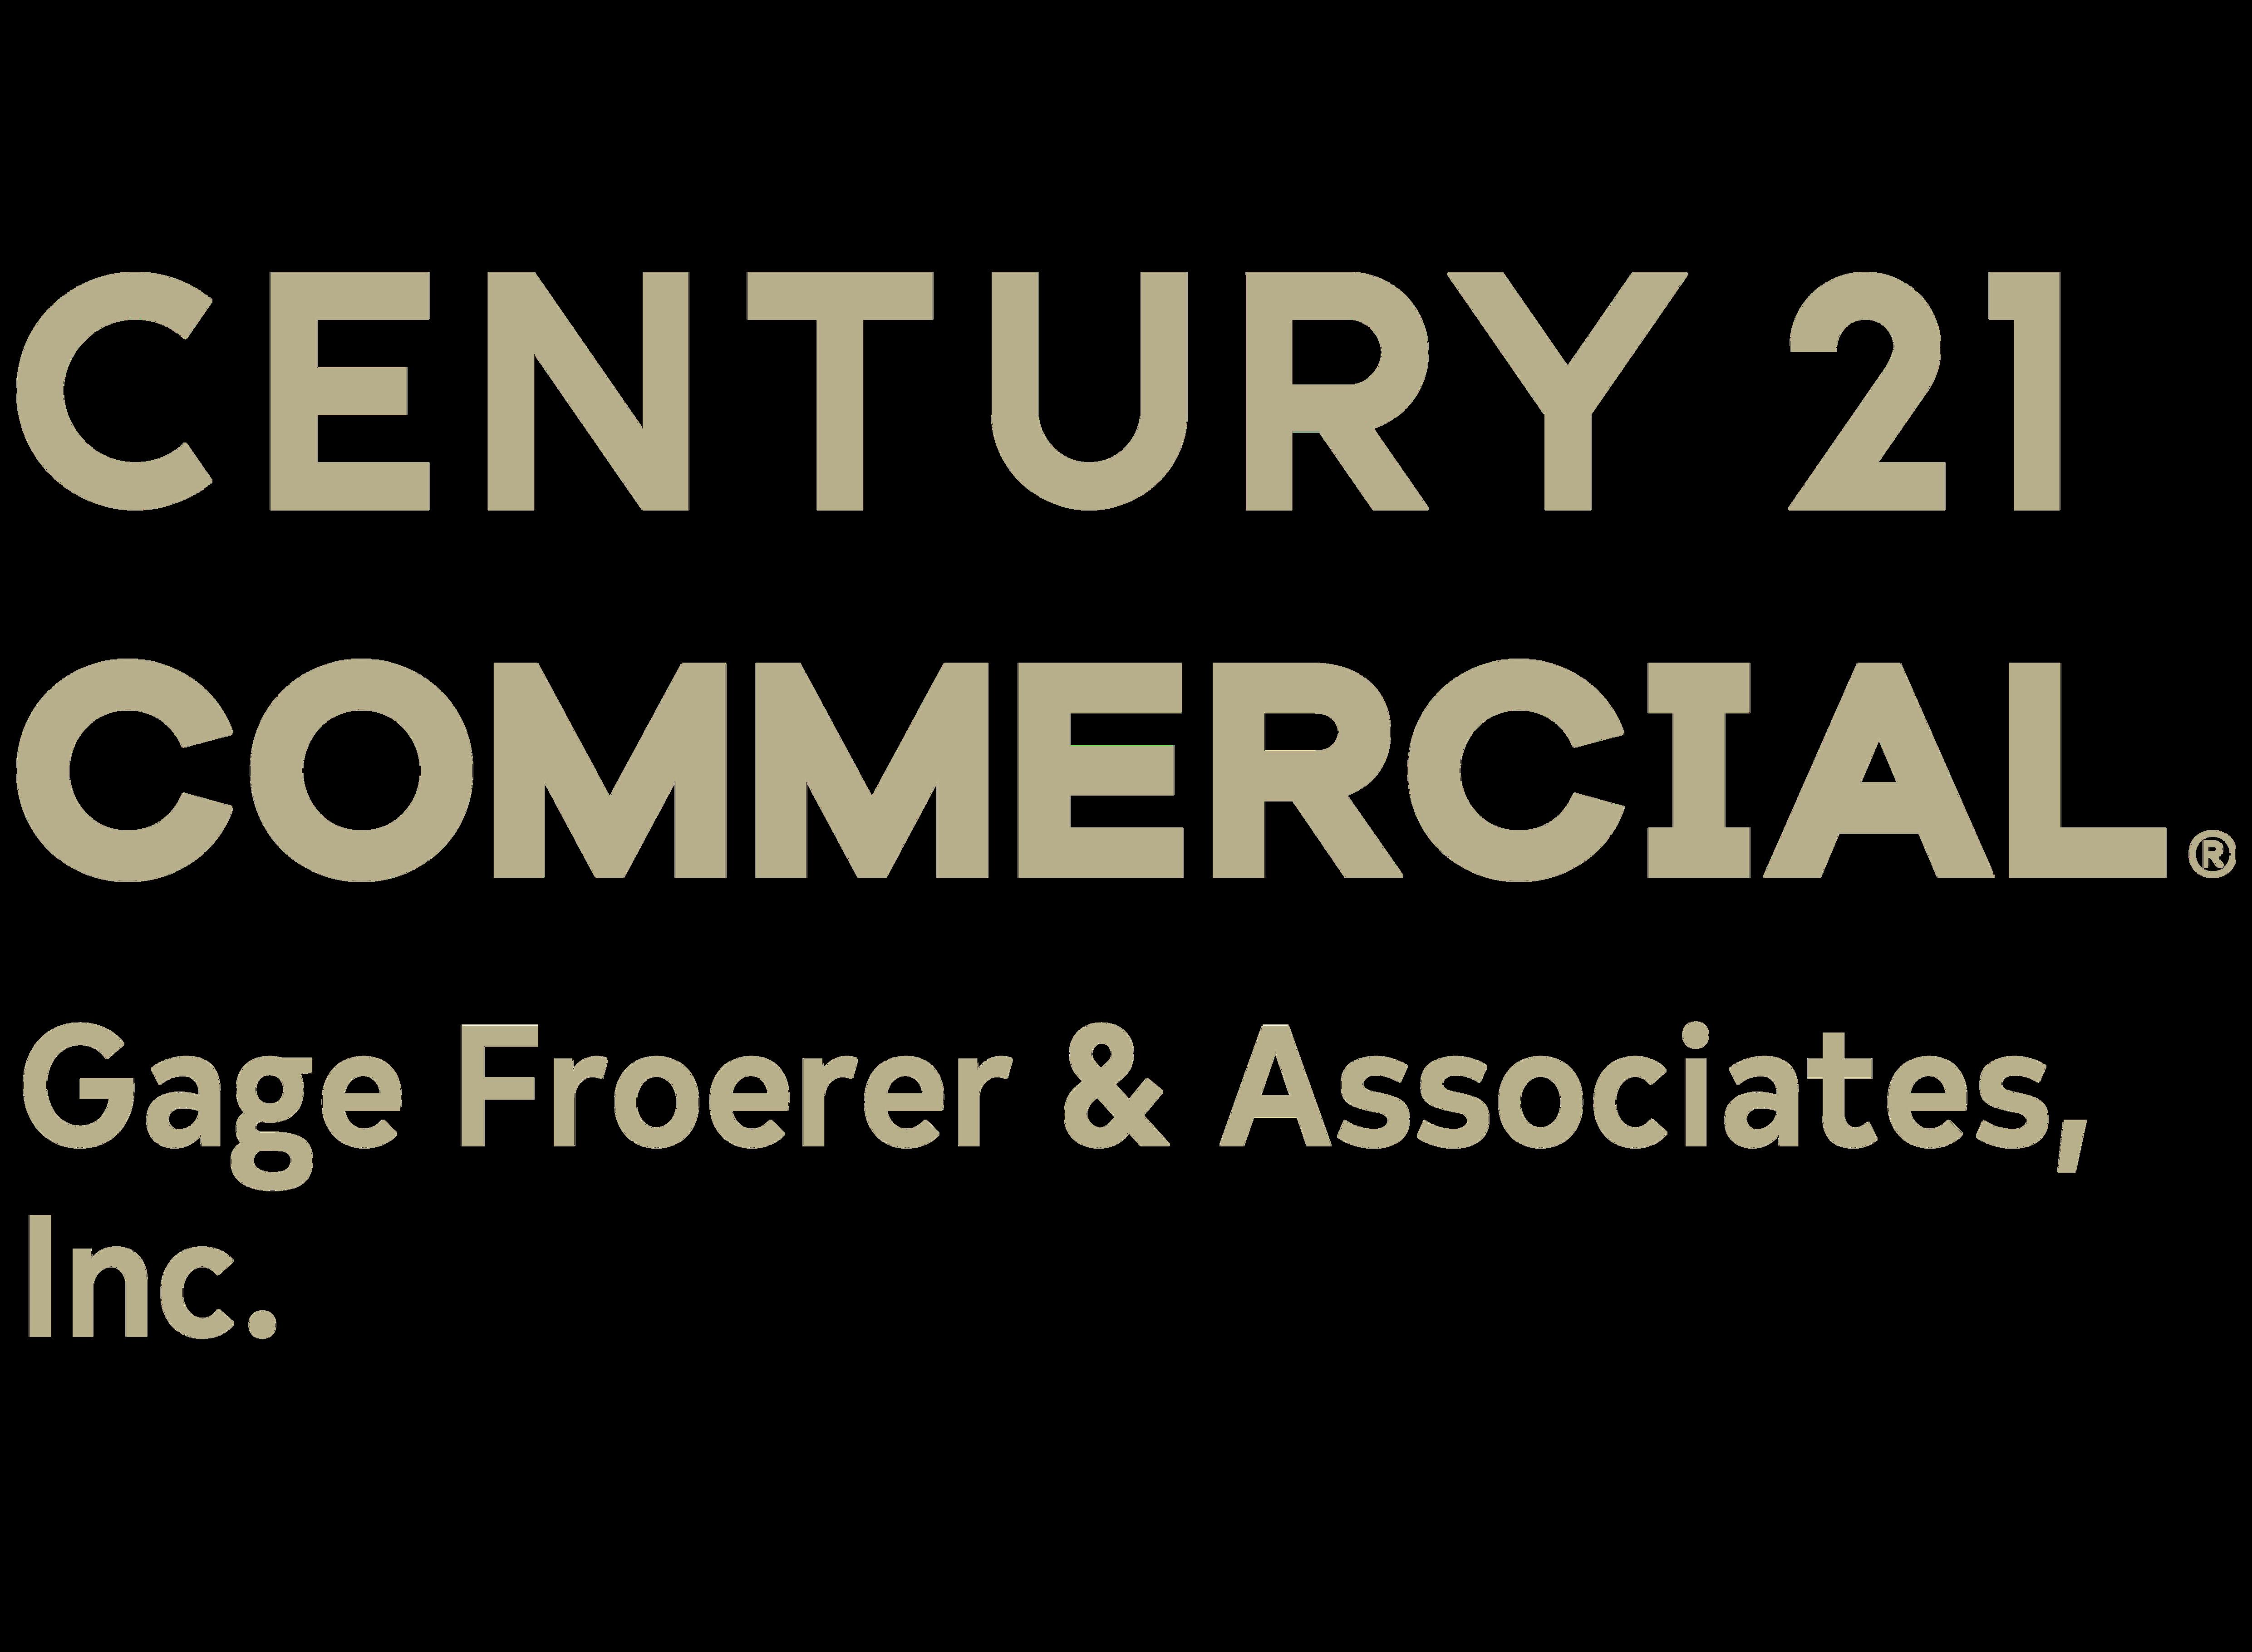 CENTURY 21 Gage Froerer & Associates, Inc.